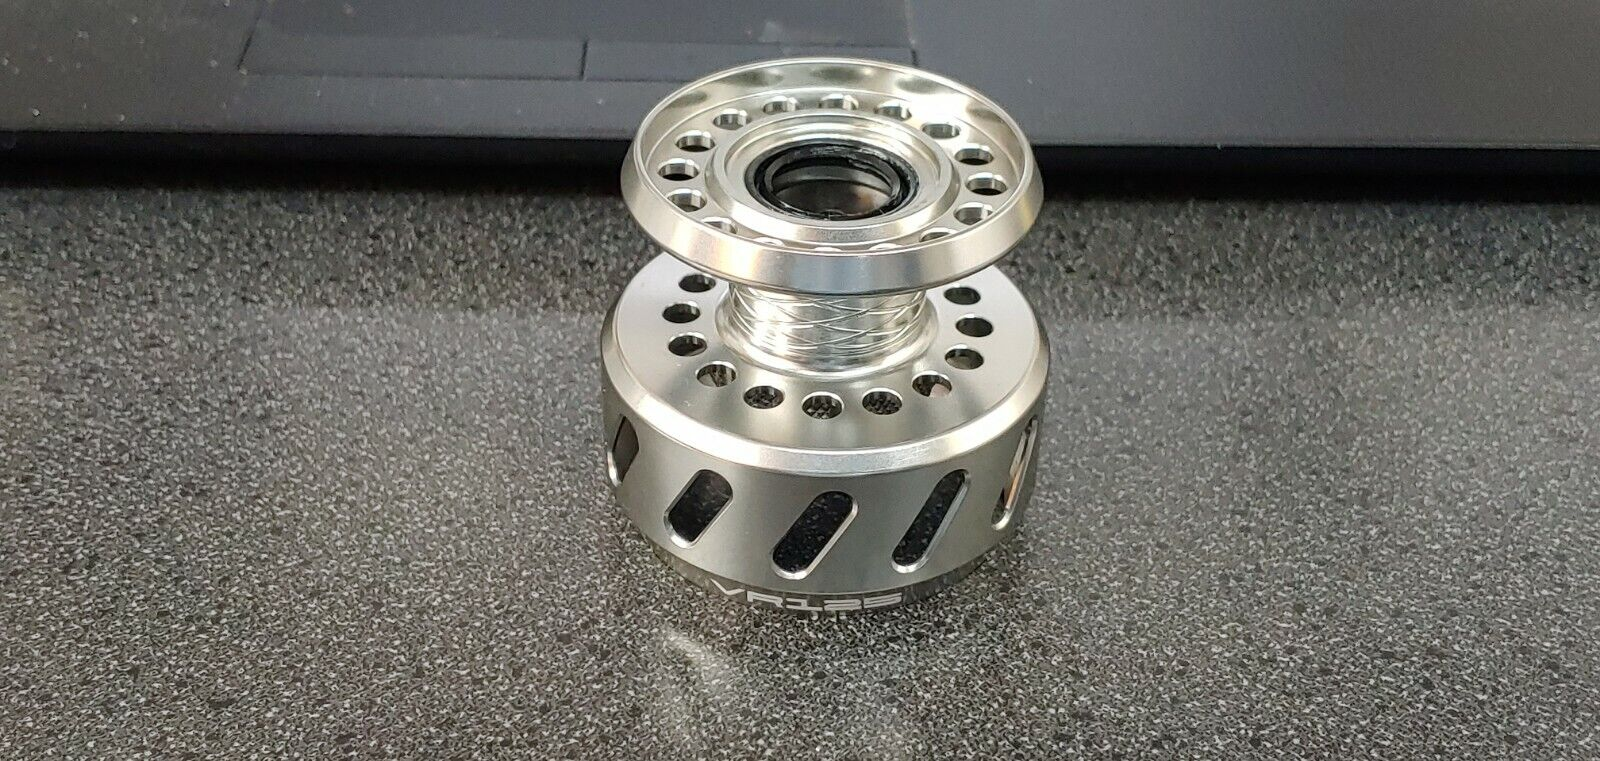 1 Van Staal PartVR321-10 Spool Assembly For VR125 Fits VR125 - VR150